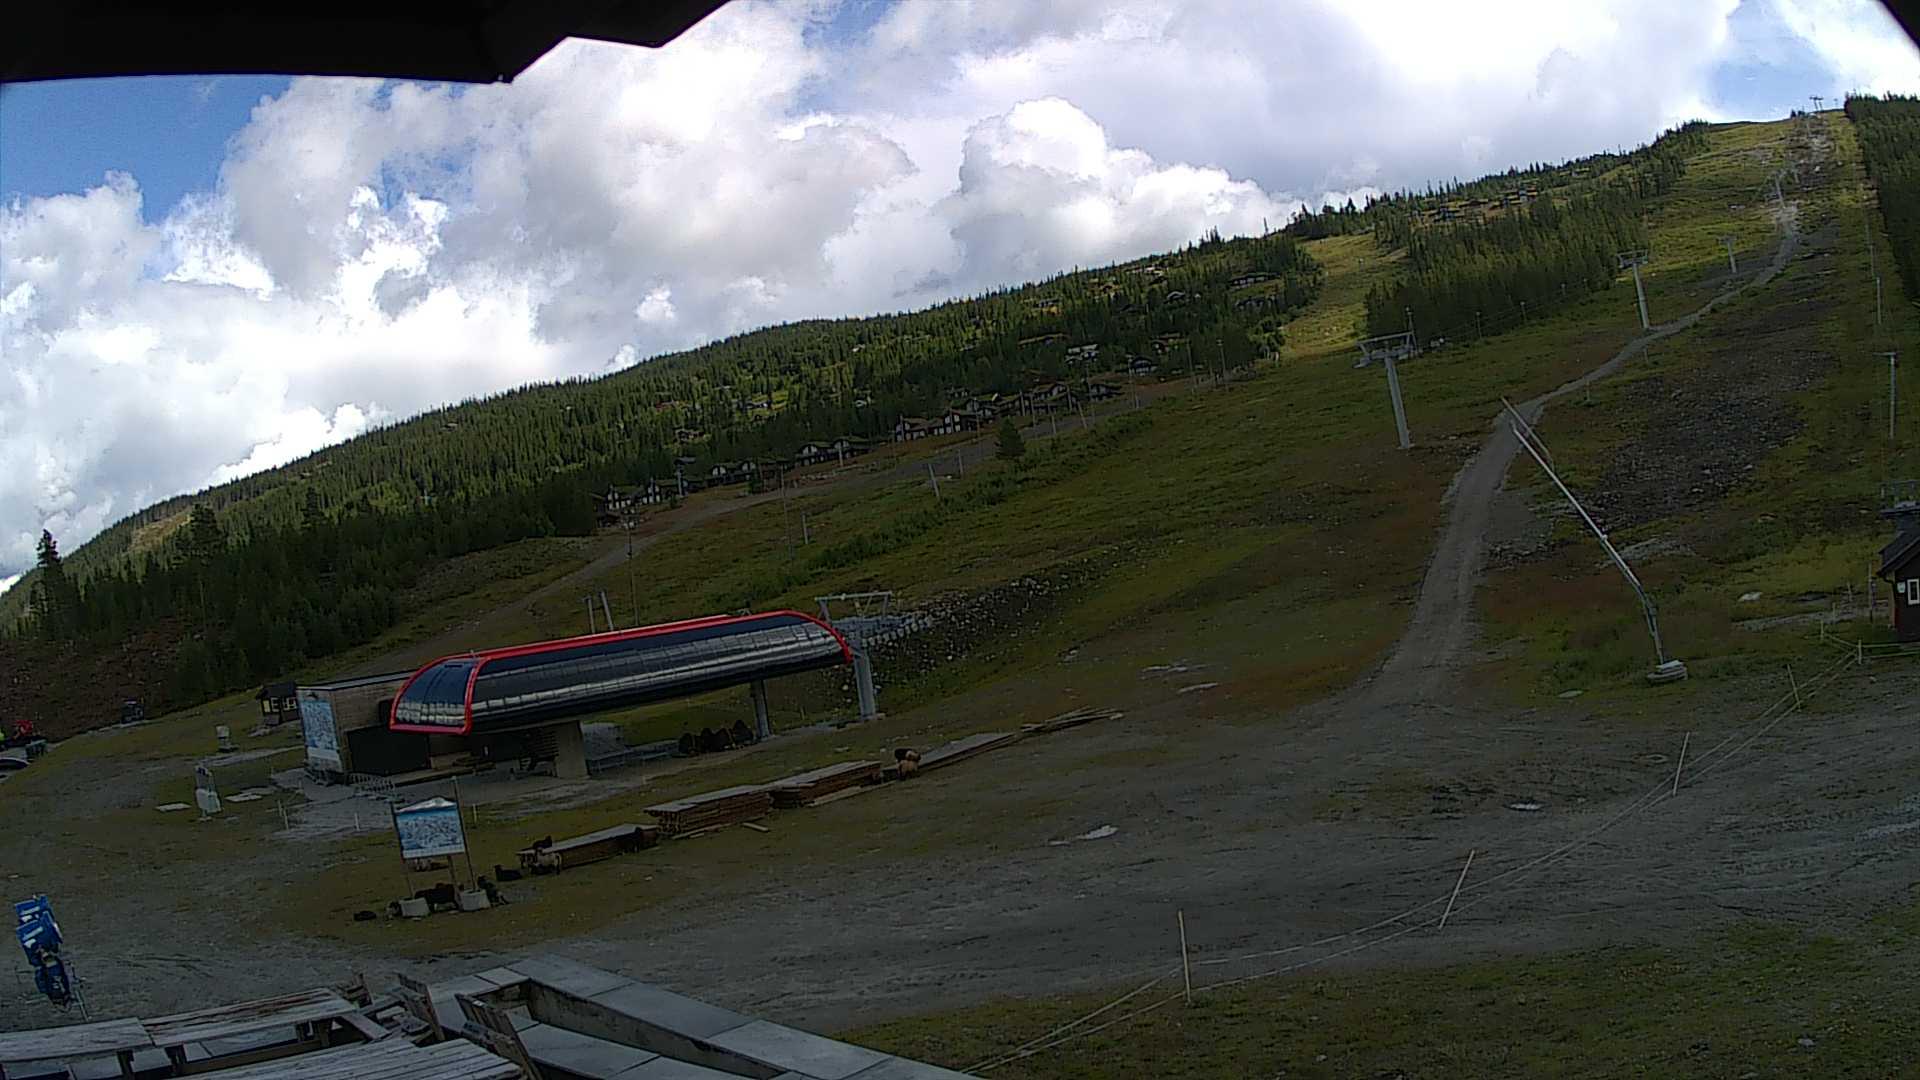 Webcam Nesbyen alpinsenter, Nes, Buskerud, Norwegen